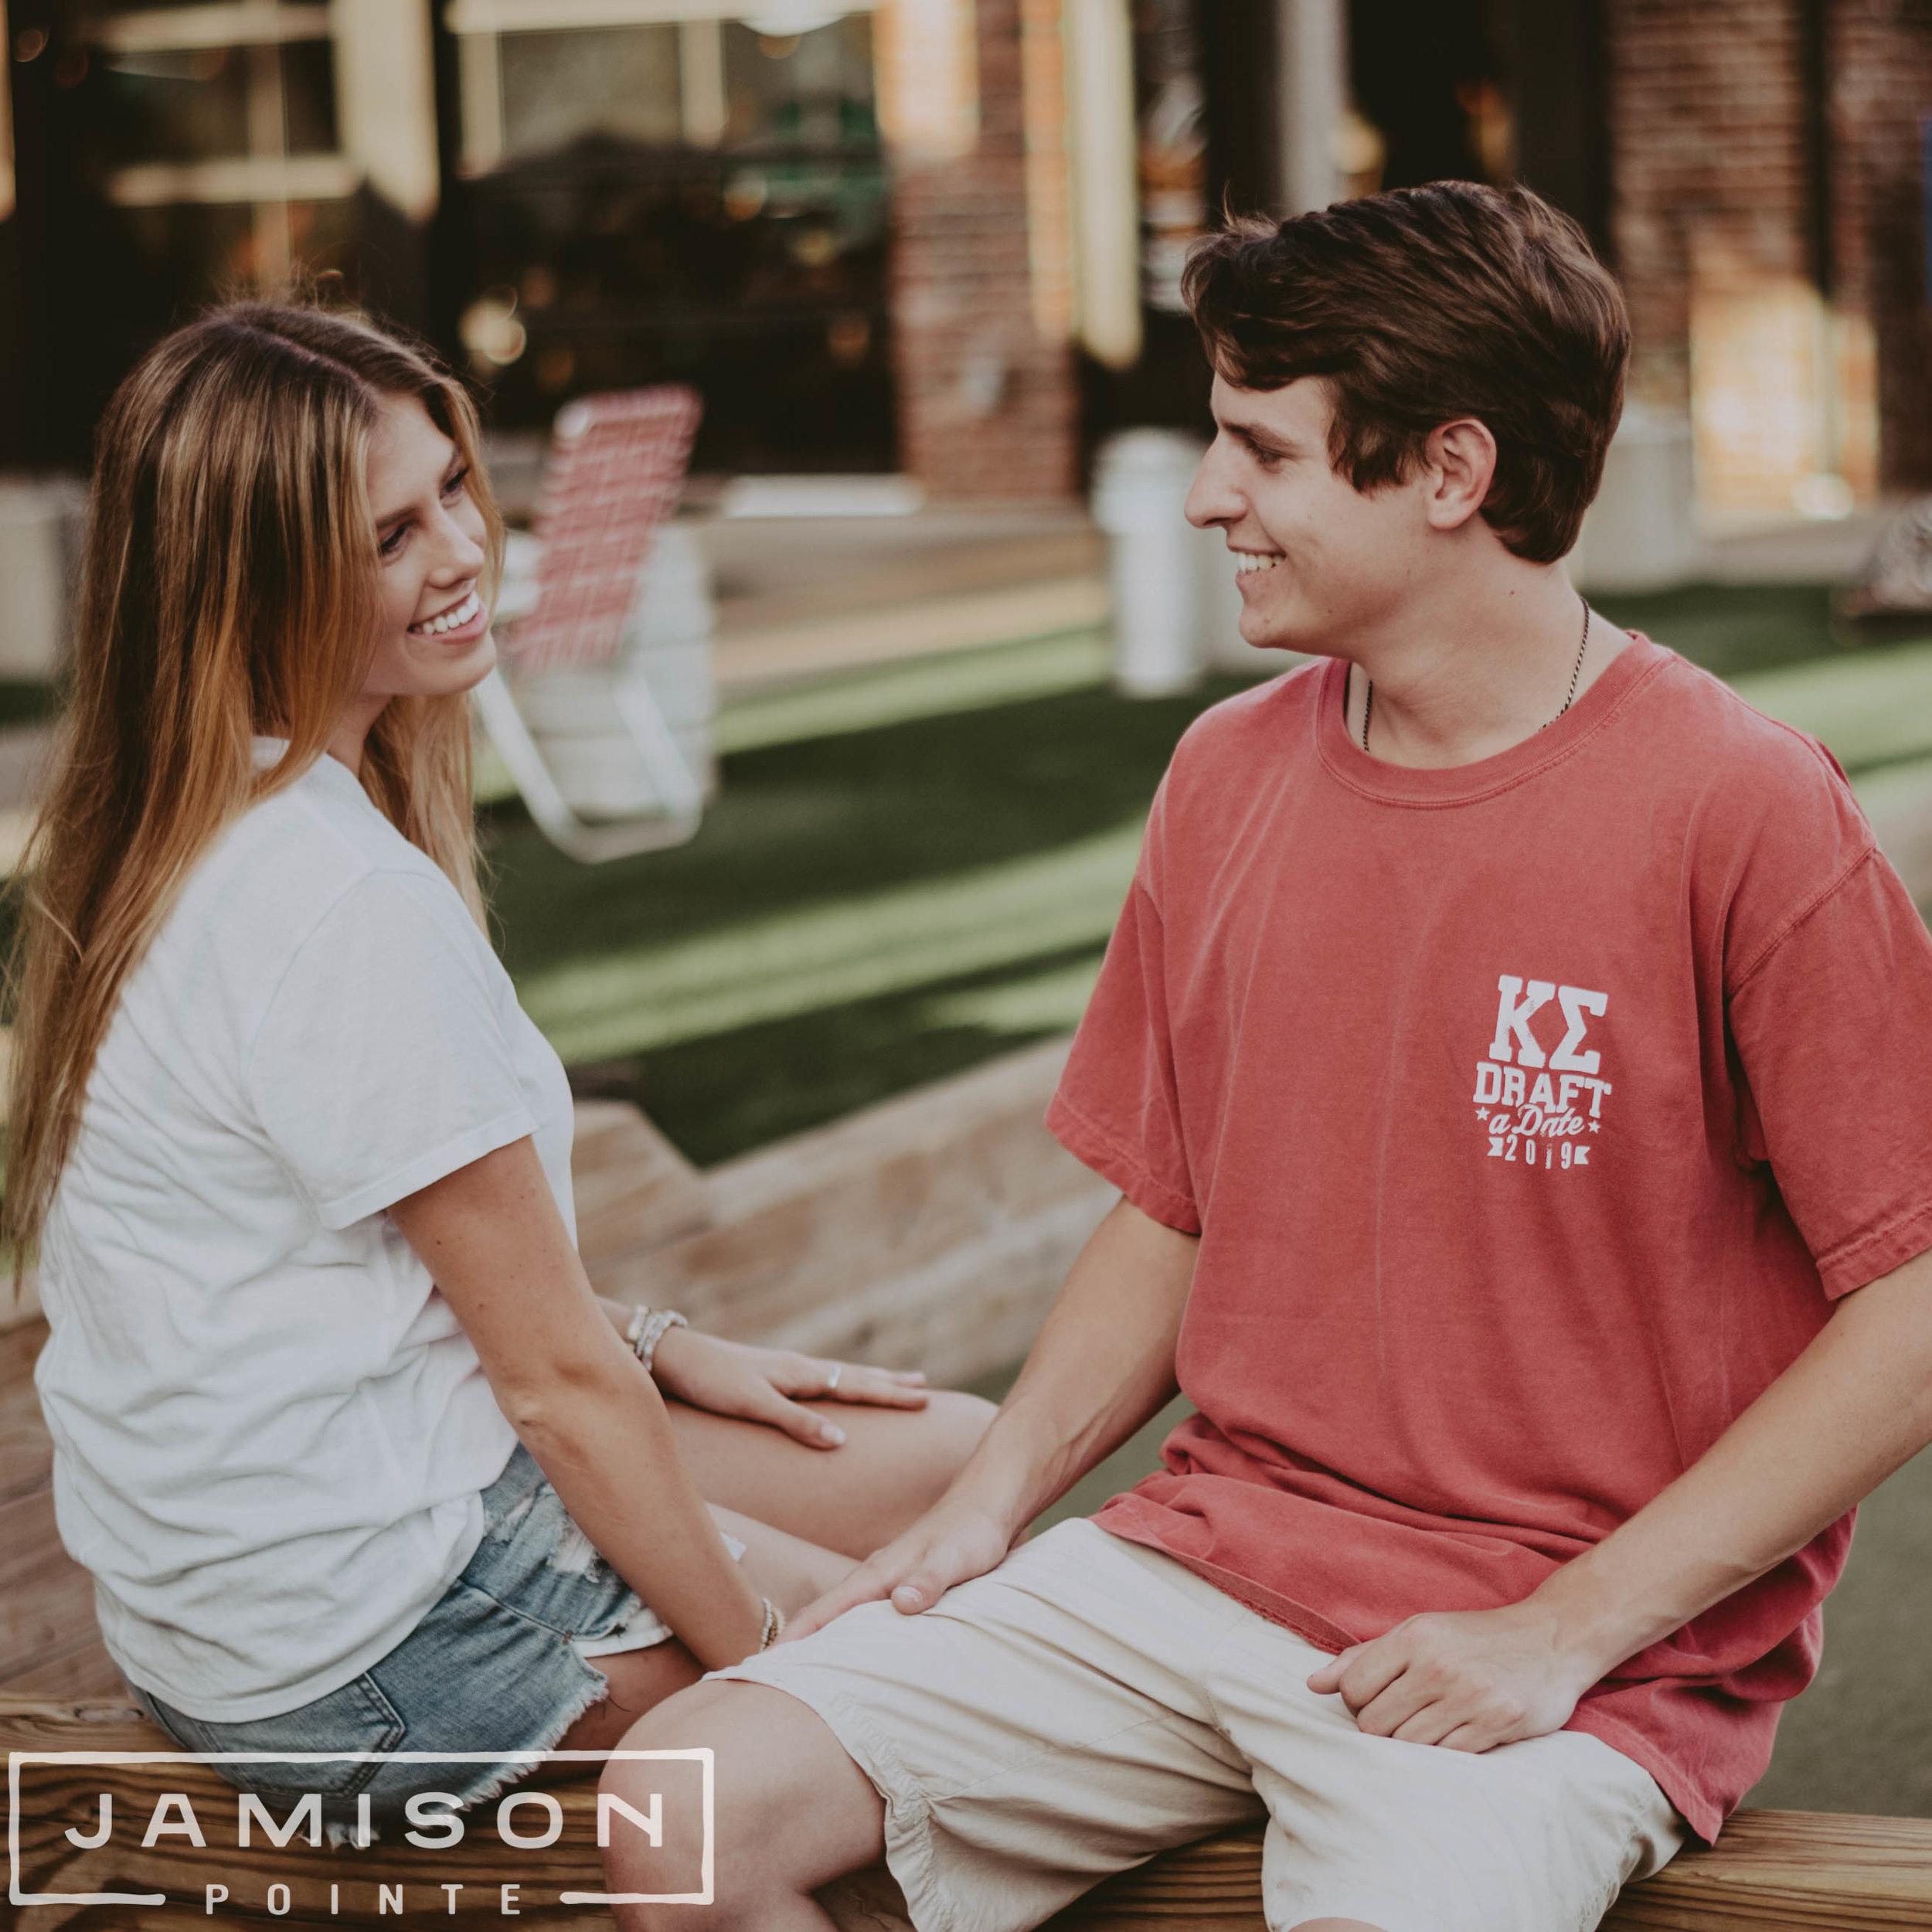 Kappa Sigma Draft a Date Tee